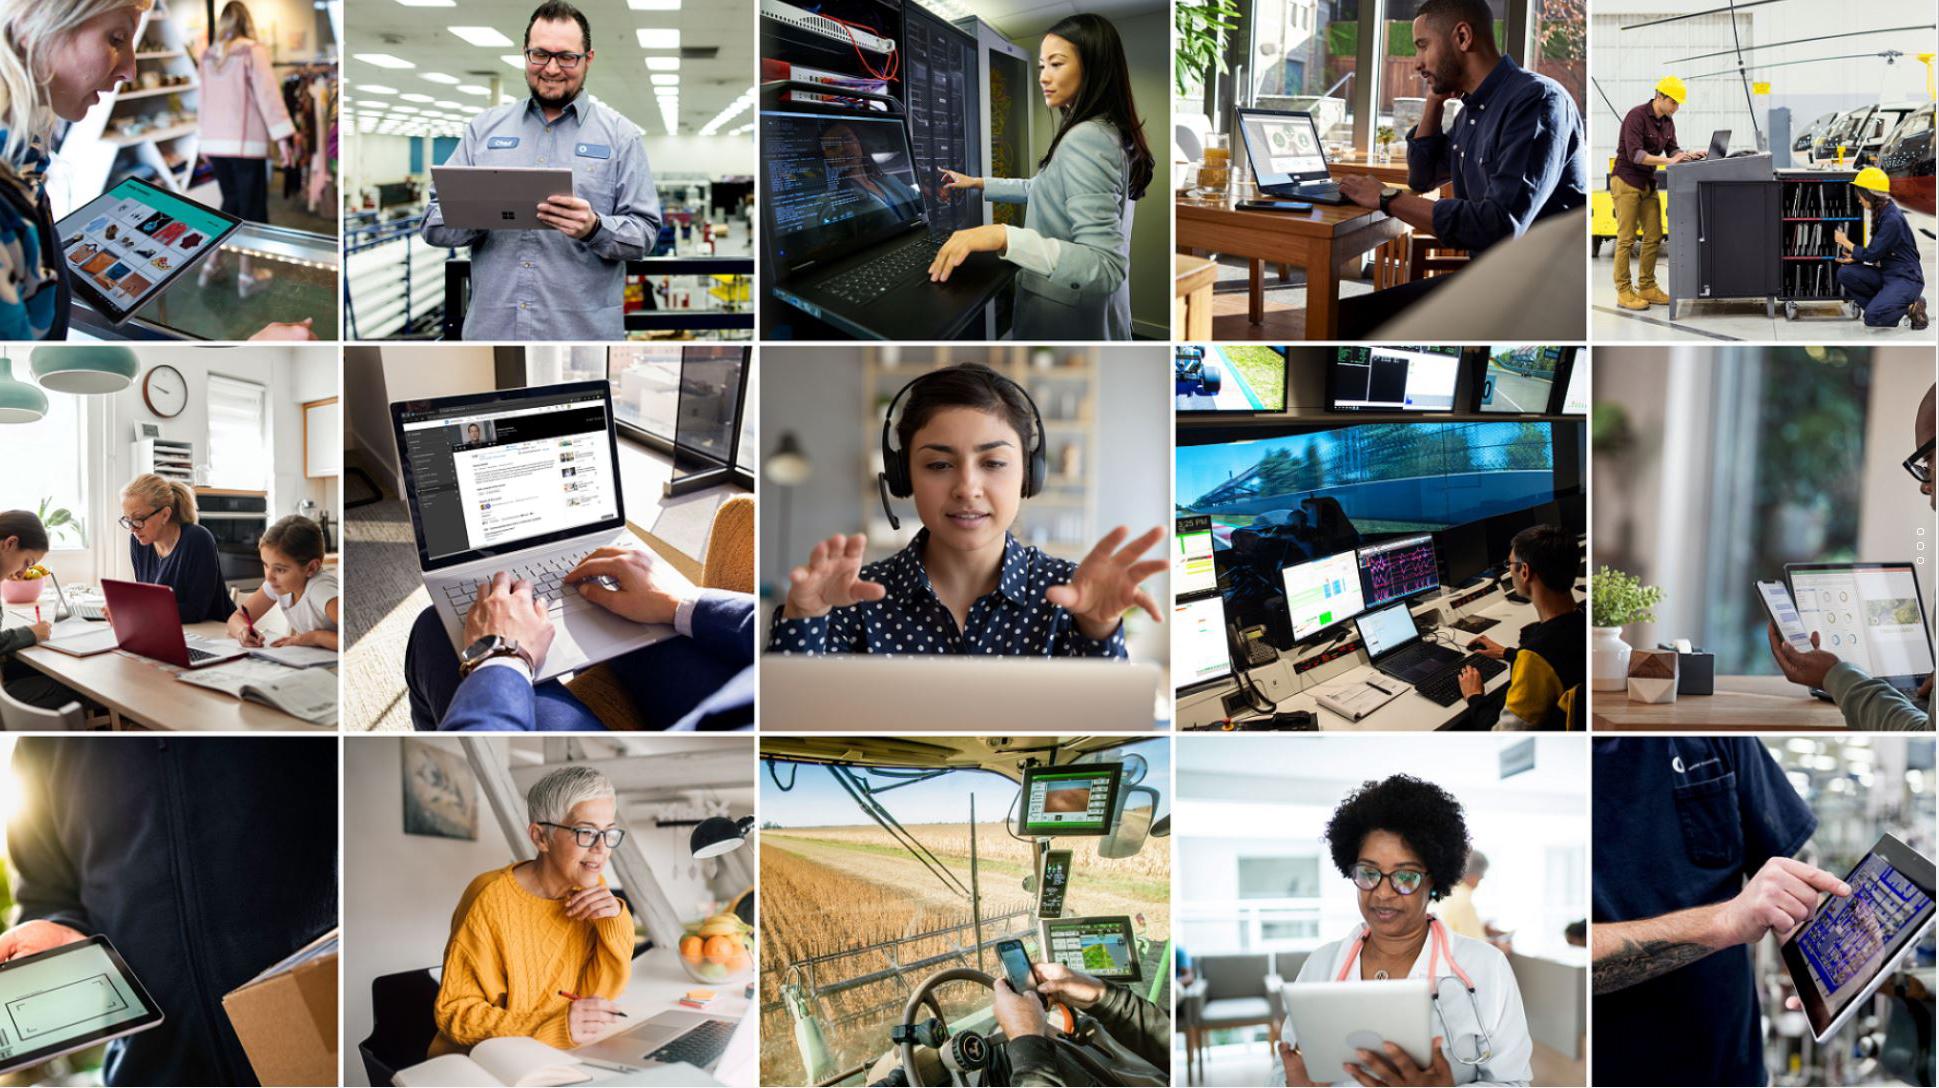 Microsoft, LinkedIn, and GitHub reach 10 million engaged learners globally since announcing digital skills initiative